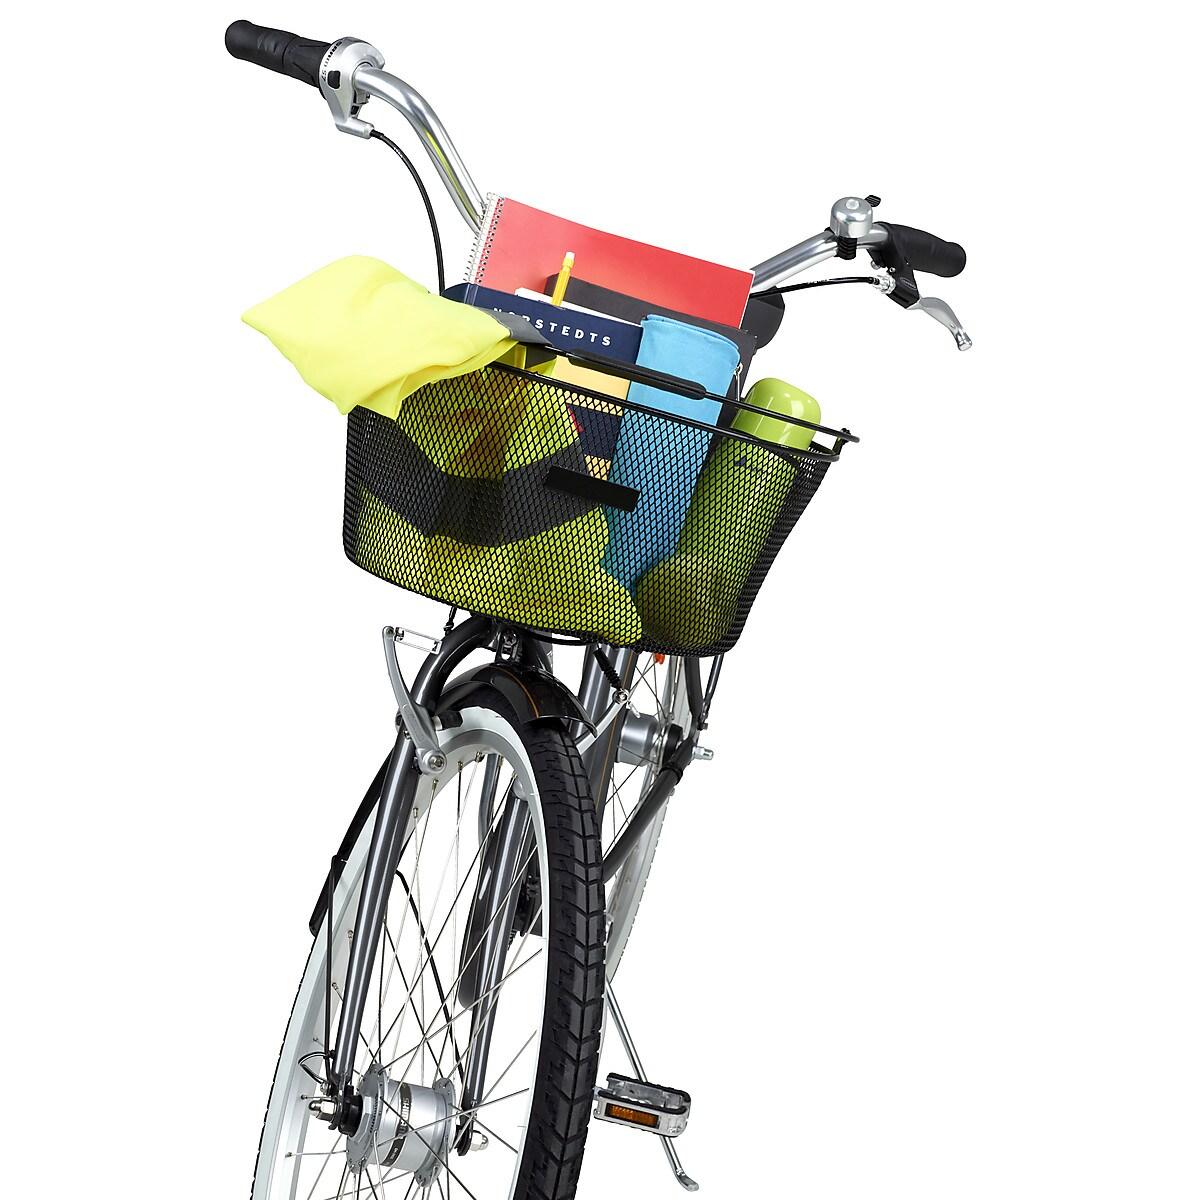 Cykelkorg Asaklitt